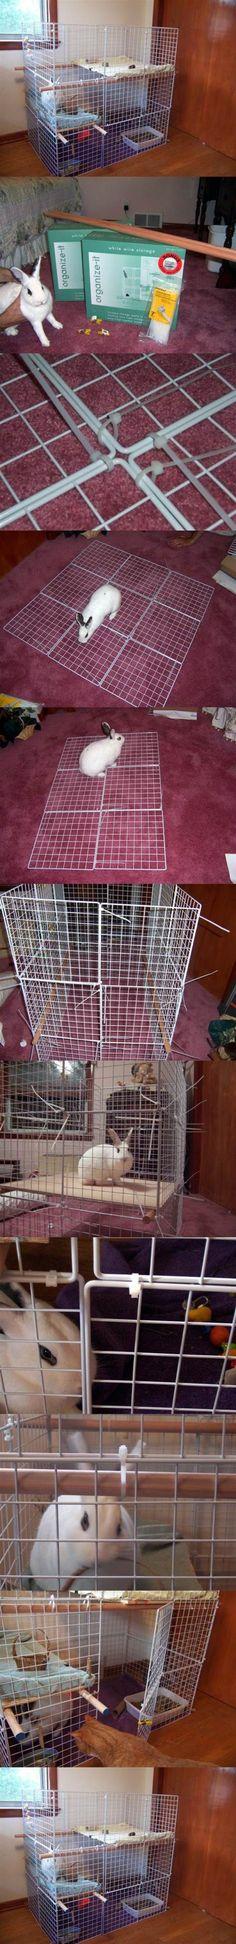 Instant Access To Woodworking Designs, DIY Patterns & Crafts Mini Lop Bunnies, Baby Bunnies, Bunny Rabbits, Bunny Cages, Rabbit Cages, Rabbit Habitat, Bunny Hutch, Indoor Rabbit, Raising Rabbits